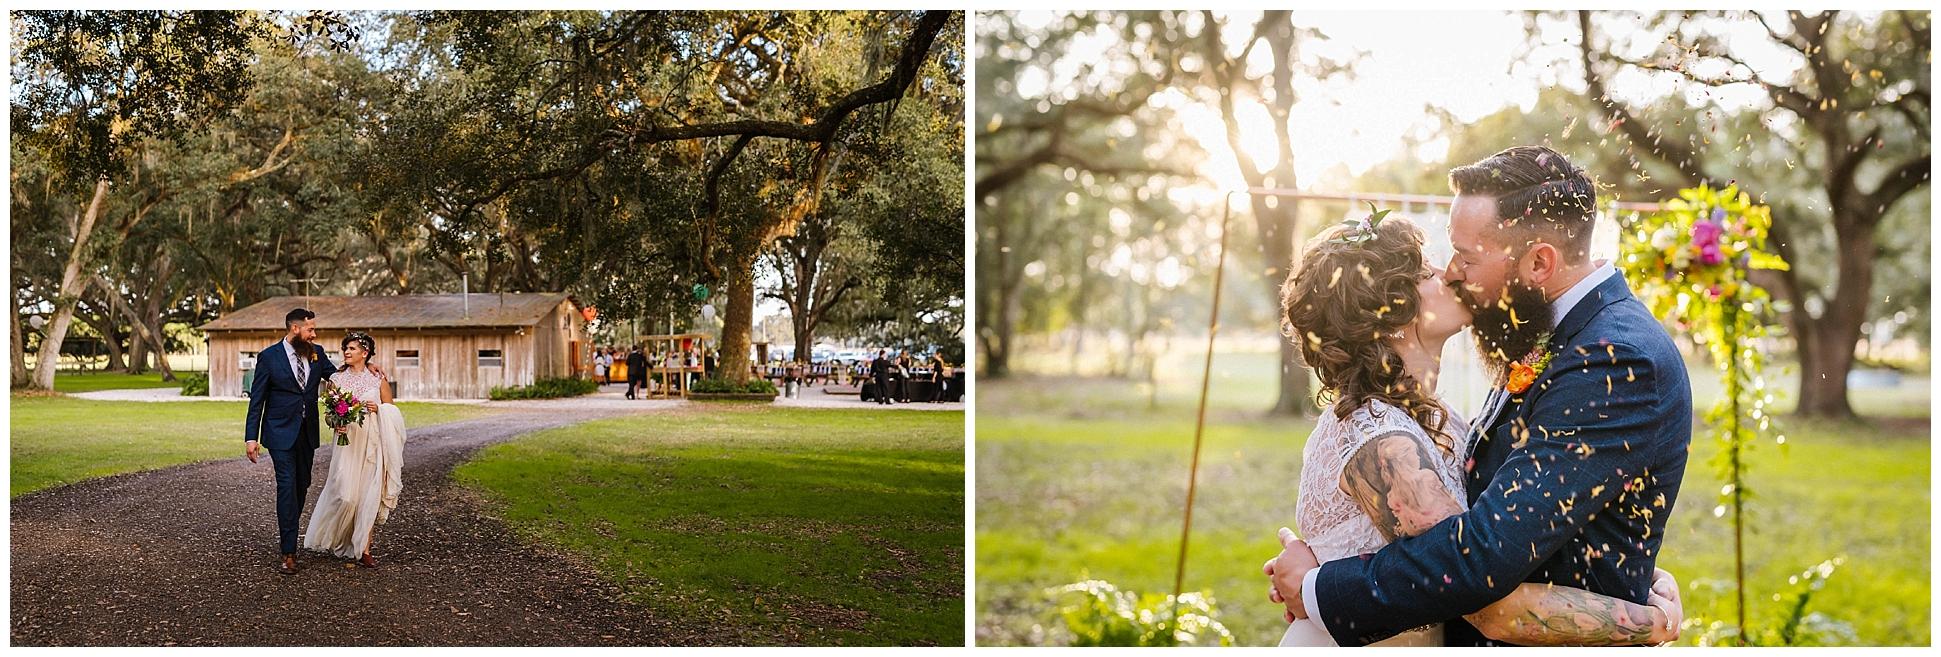 magical-outdoor-florida-wedding-smoke-bombs-flowers-crown-beard_0040.jpg